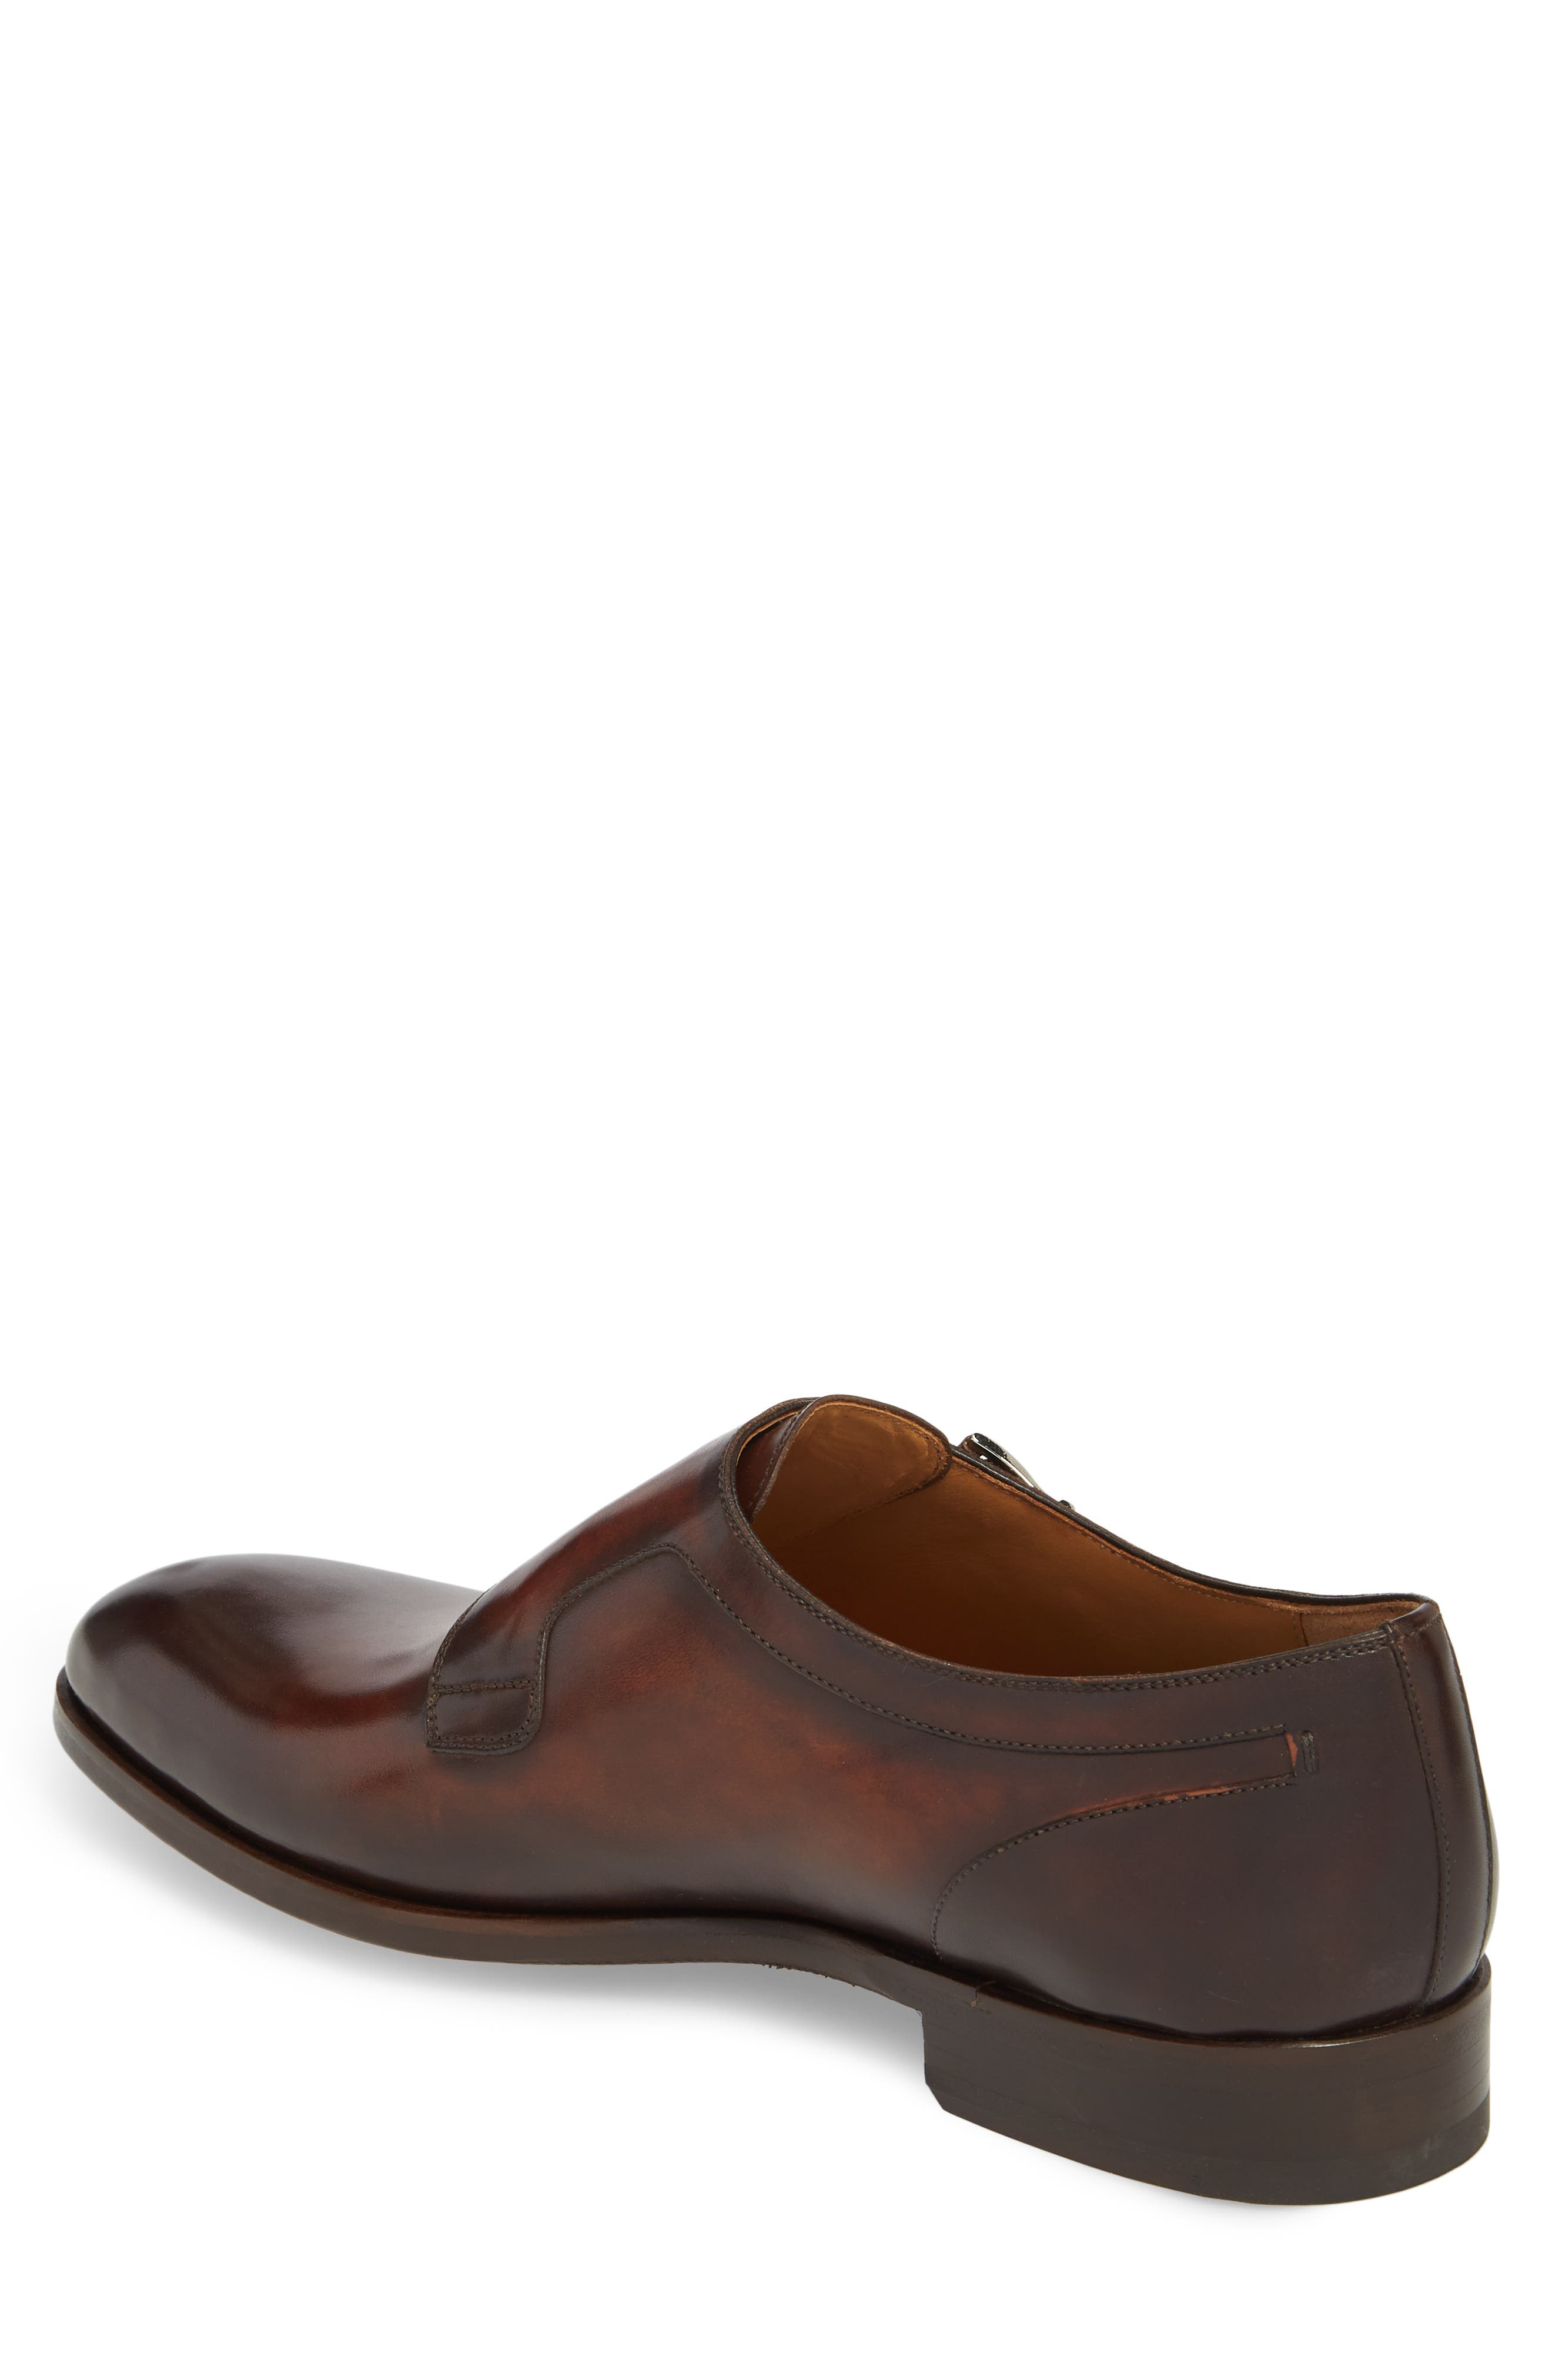 Pratt Double Strap Monk Shoe,                             Alternate thumbnail 2, color,